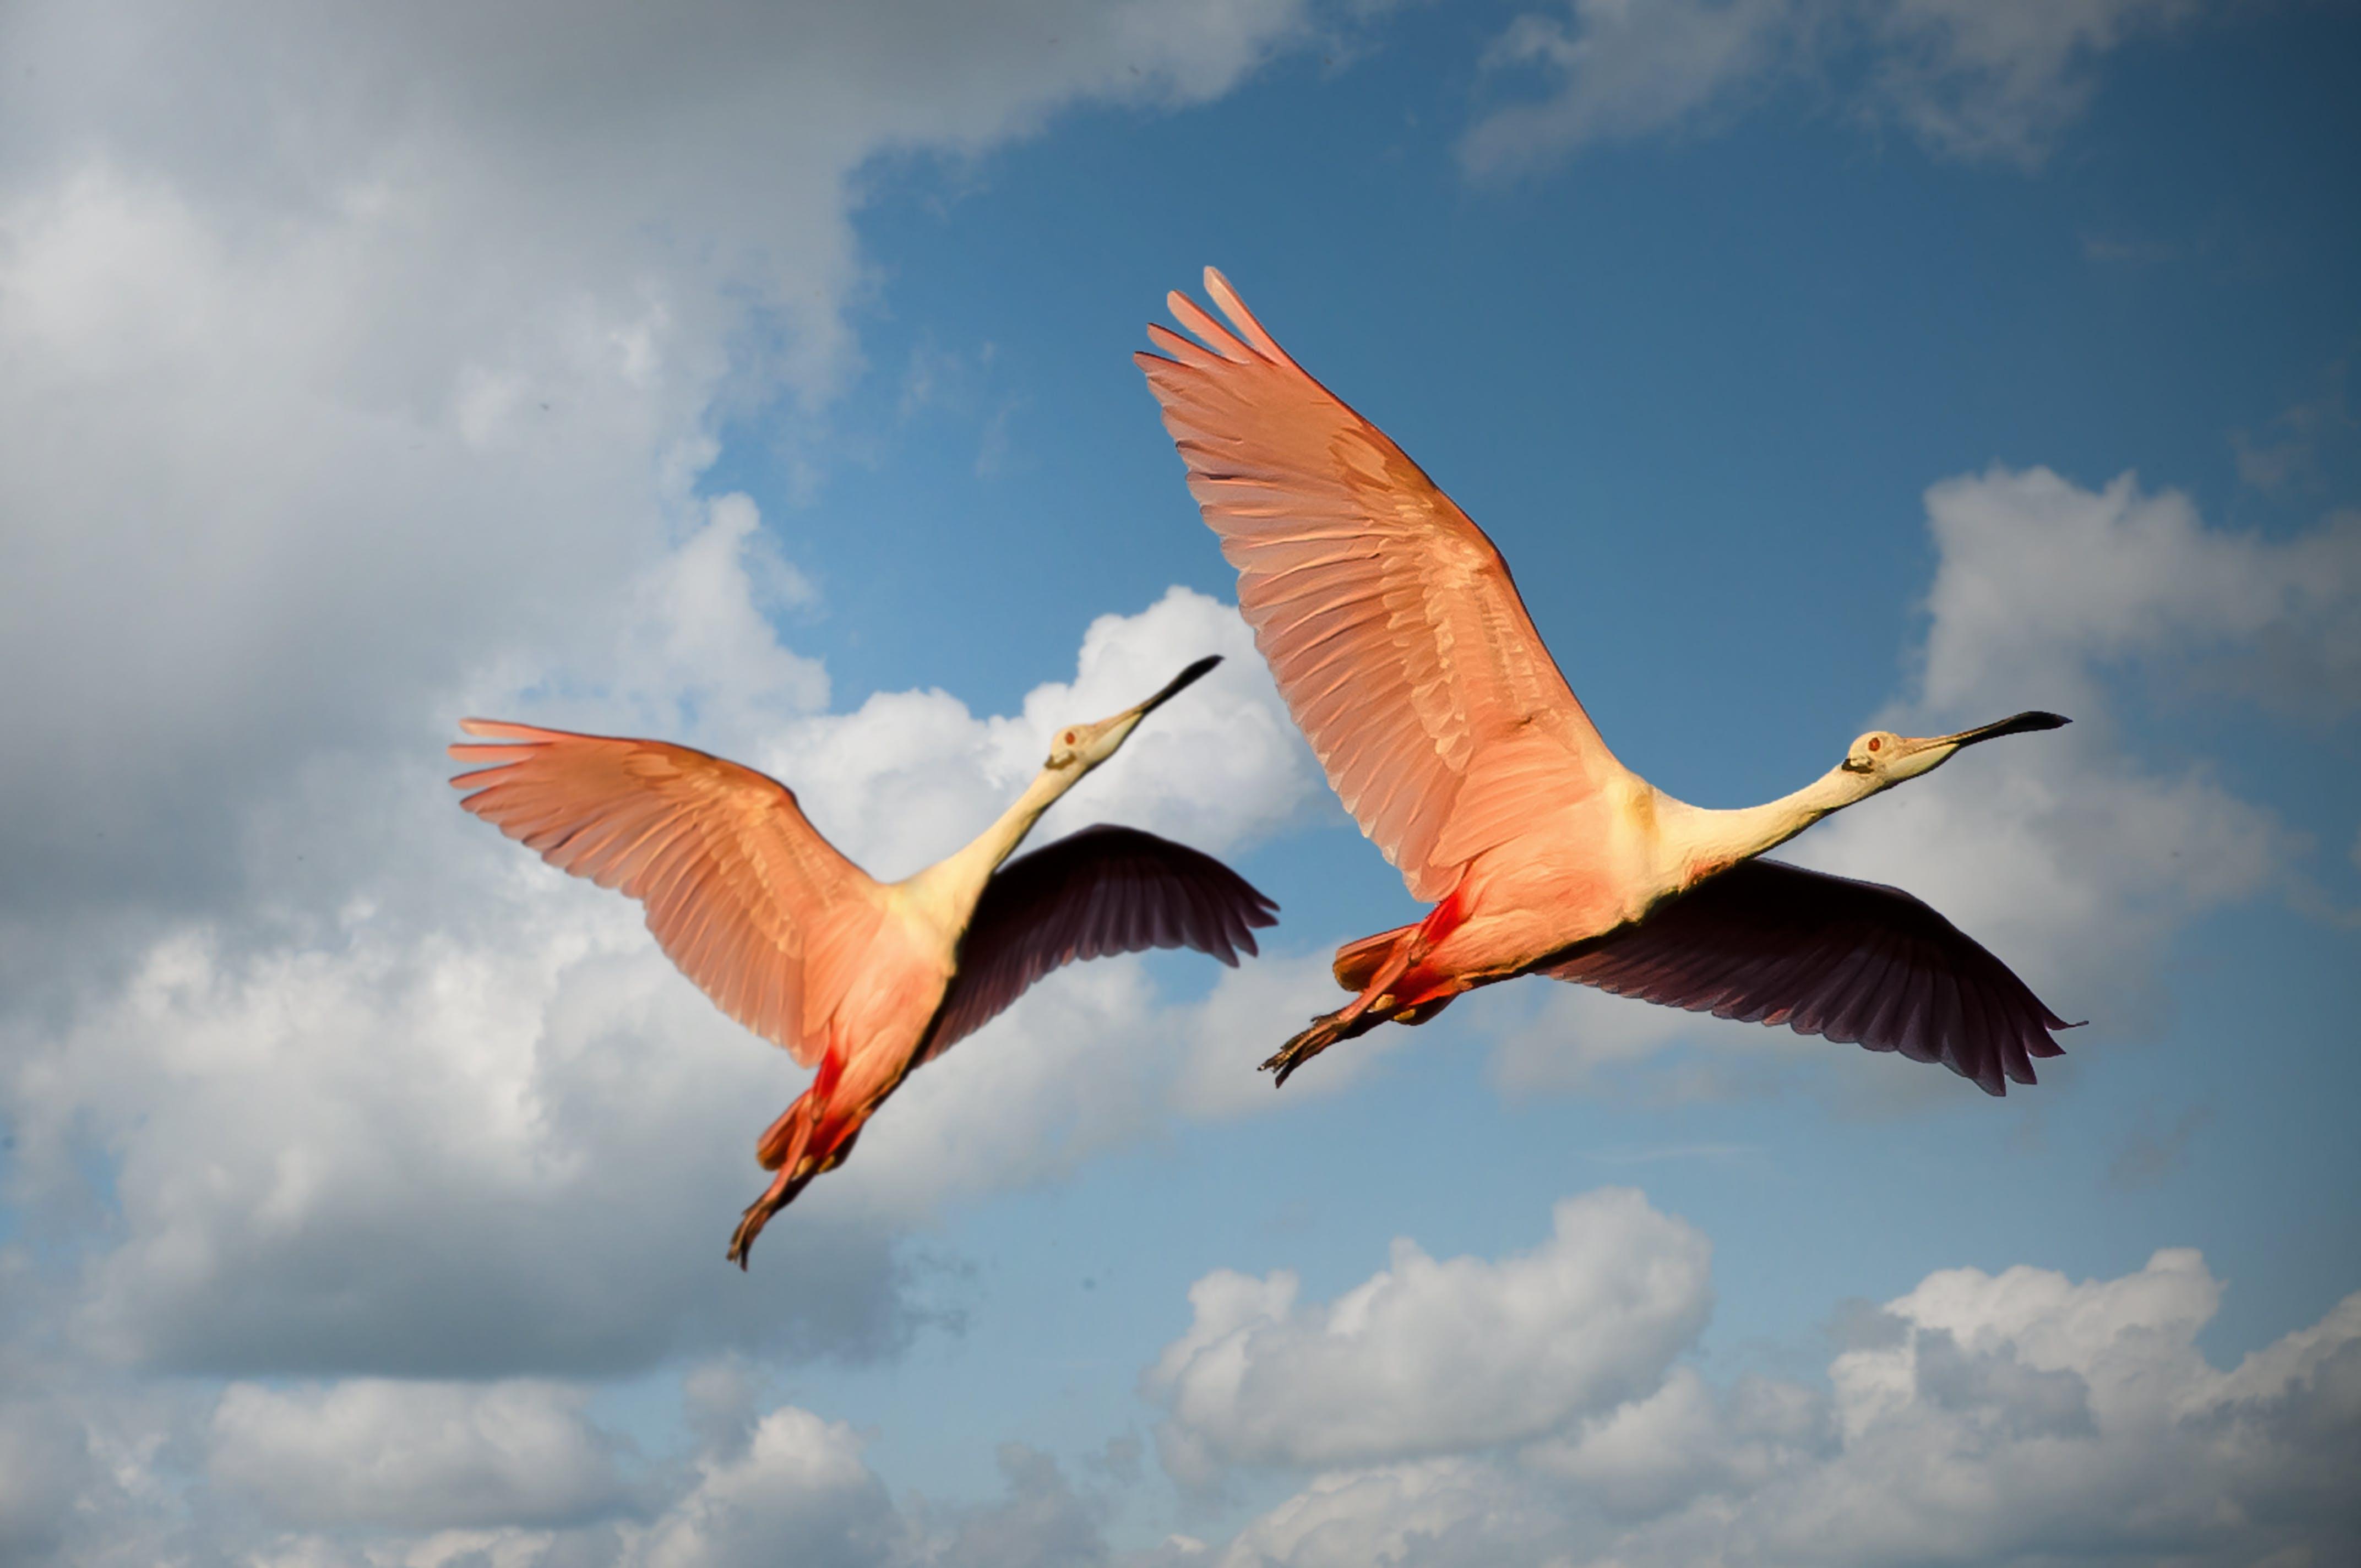 animals, avian, beaks